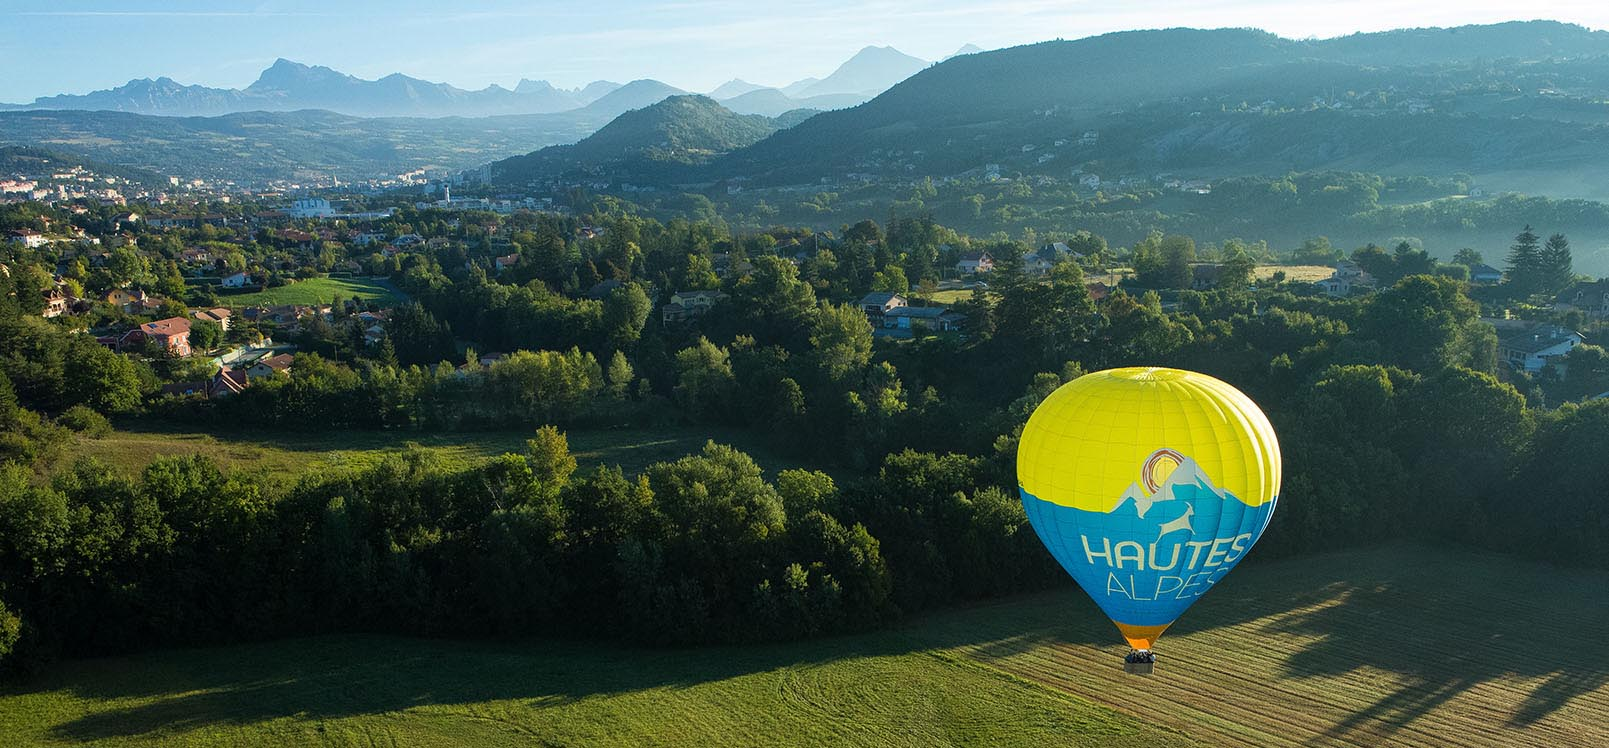 Gap-Tallard Hautes-Alpes